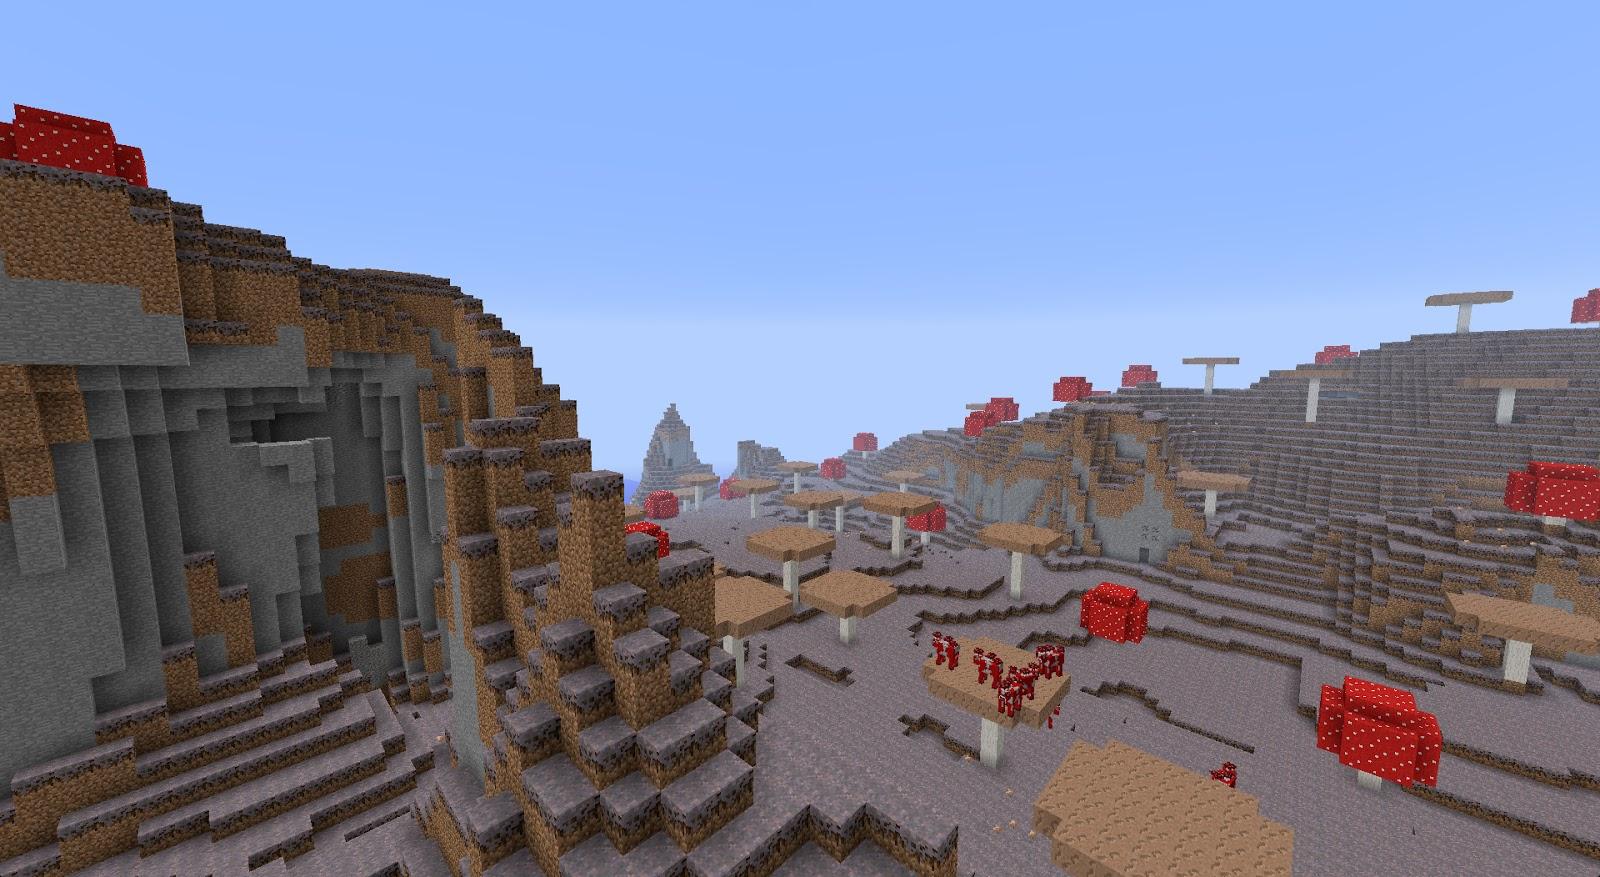 Minecraft seed: -21937183521